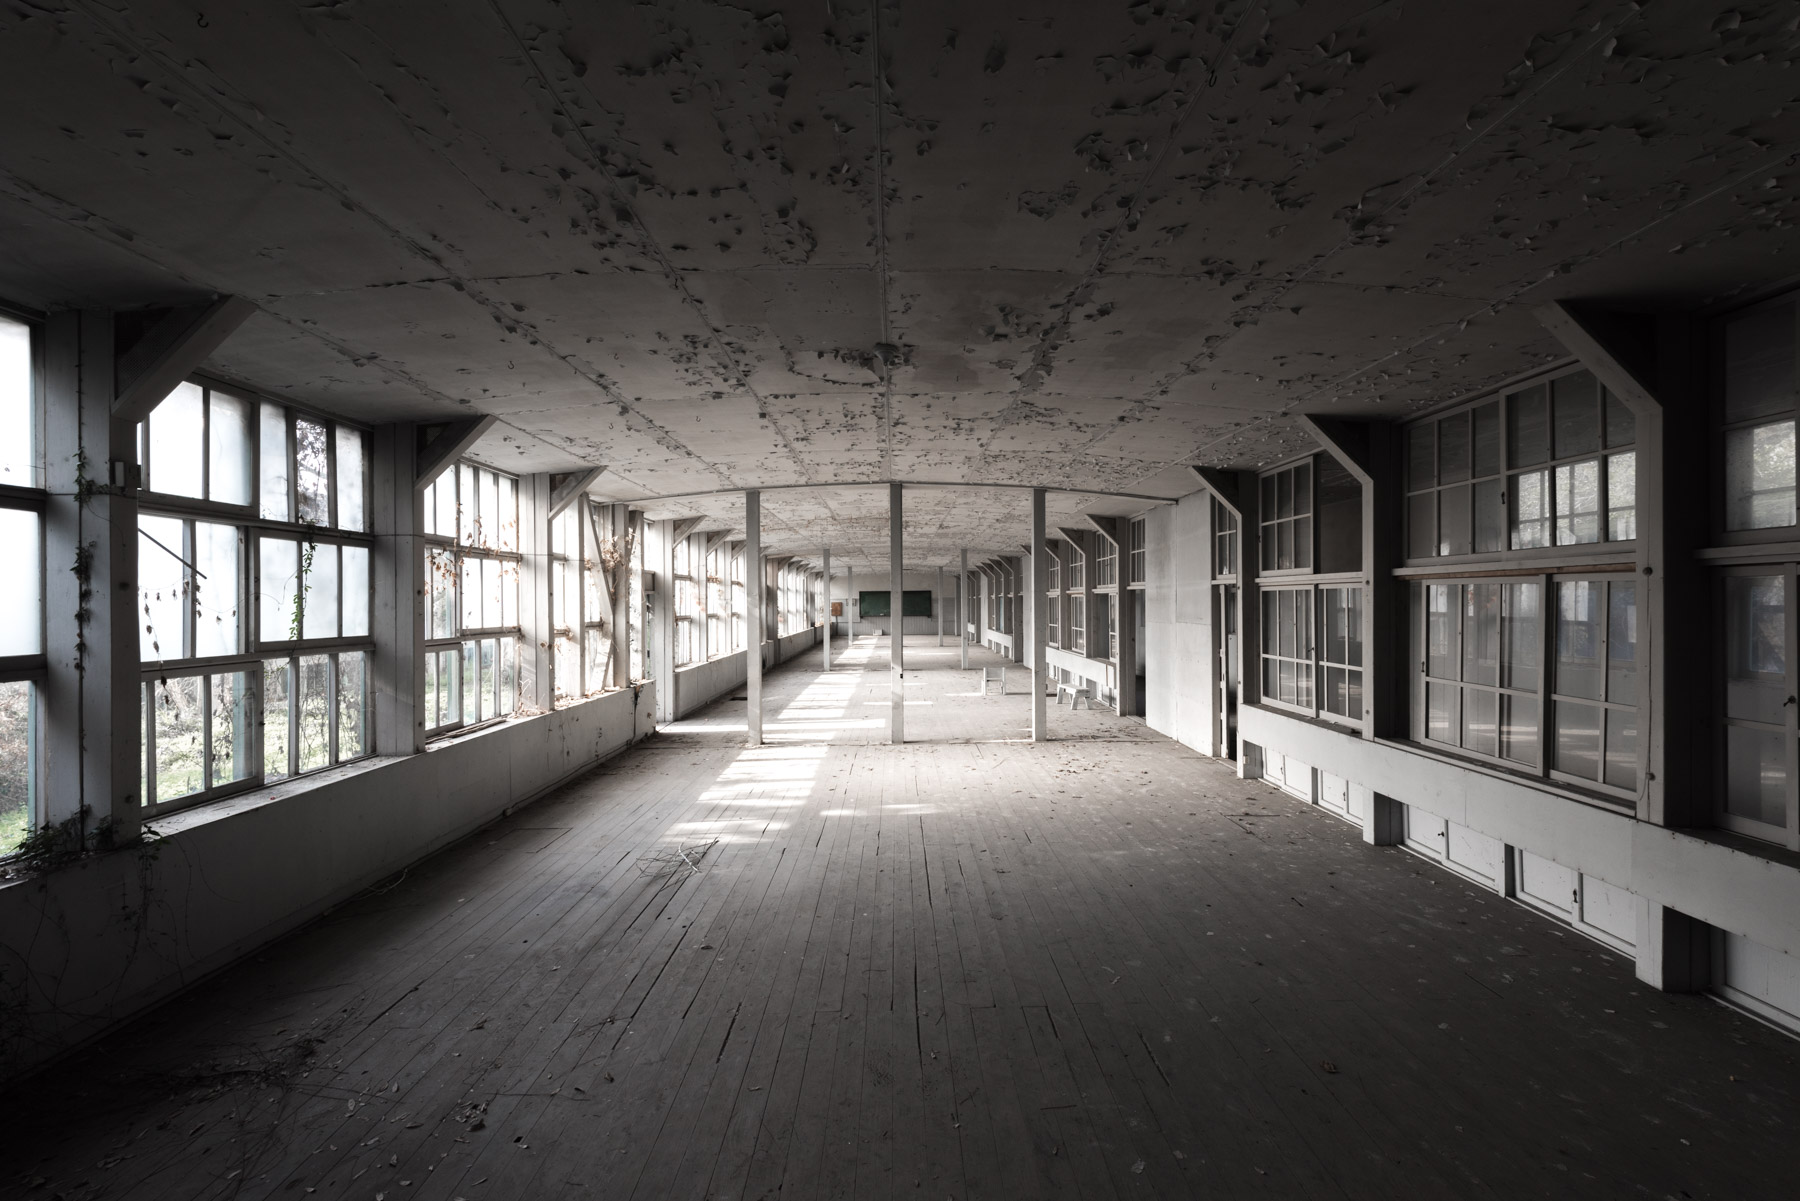 abandoned, asia, chugoku, haikyo, japan, japanese, okayama, ruin, school, urban exploration, urbex